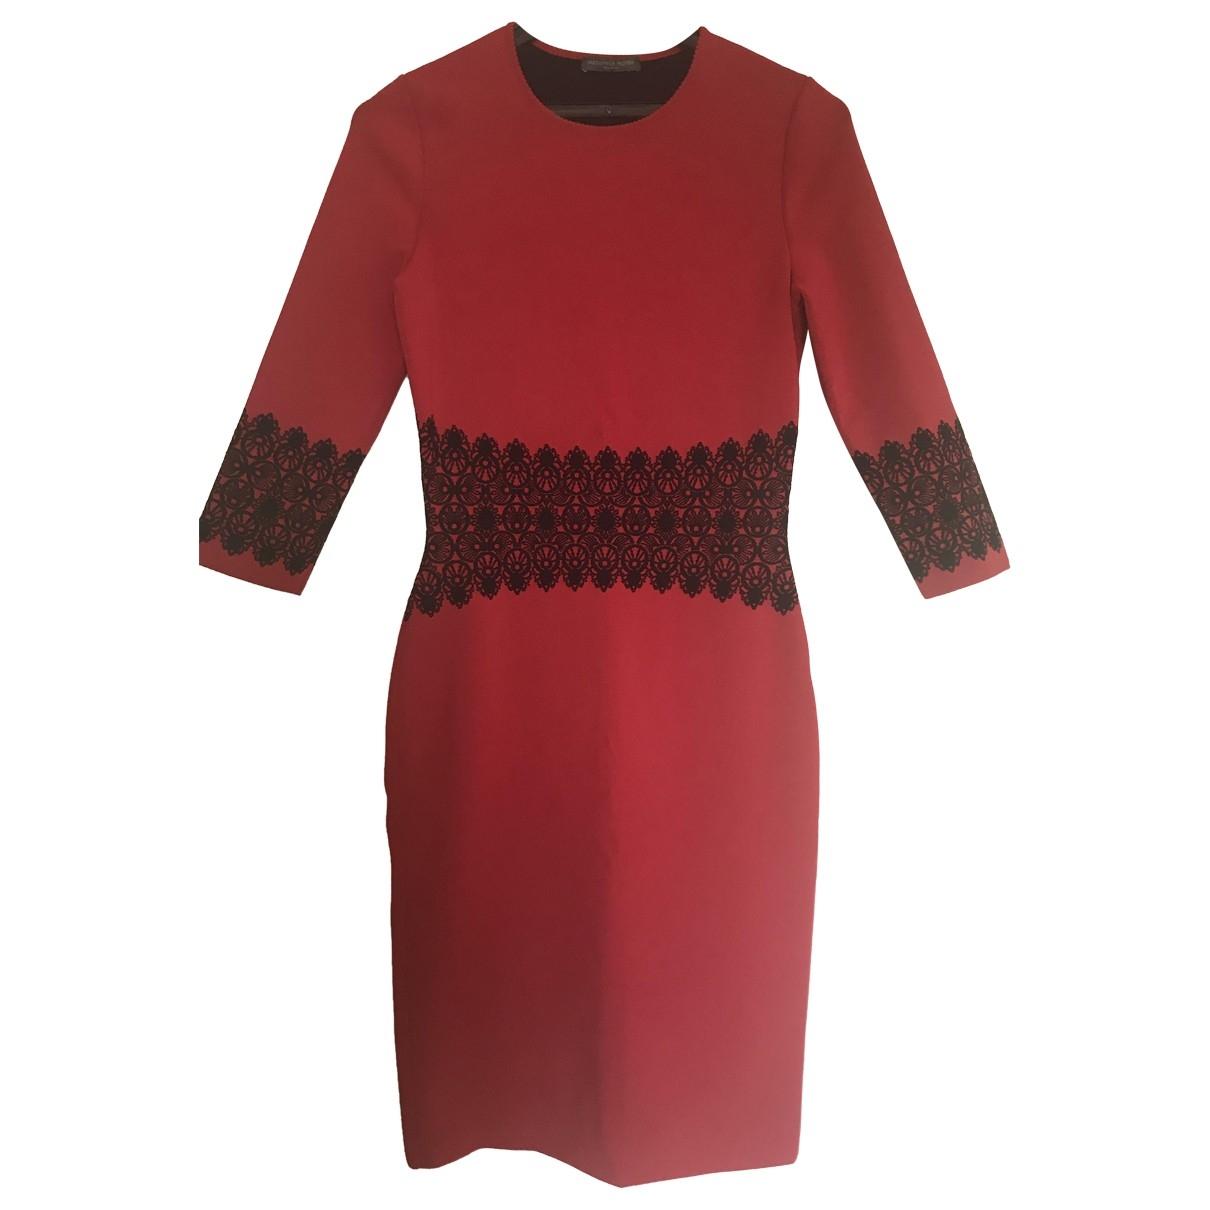 Alexander Mcqueen \N Red dress for Women 10 UK